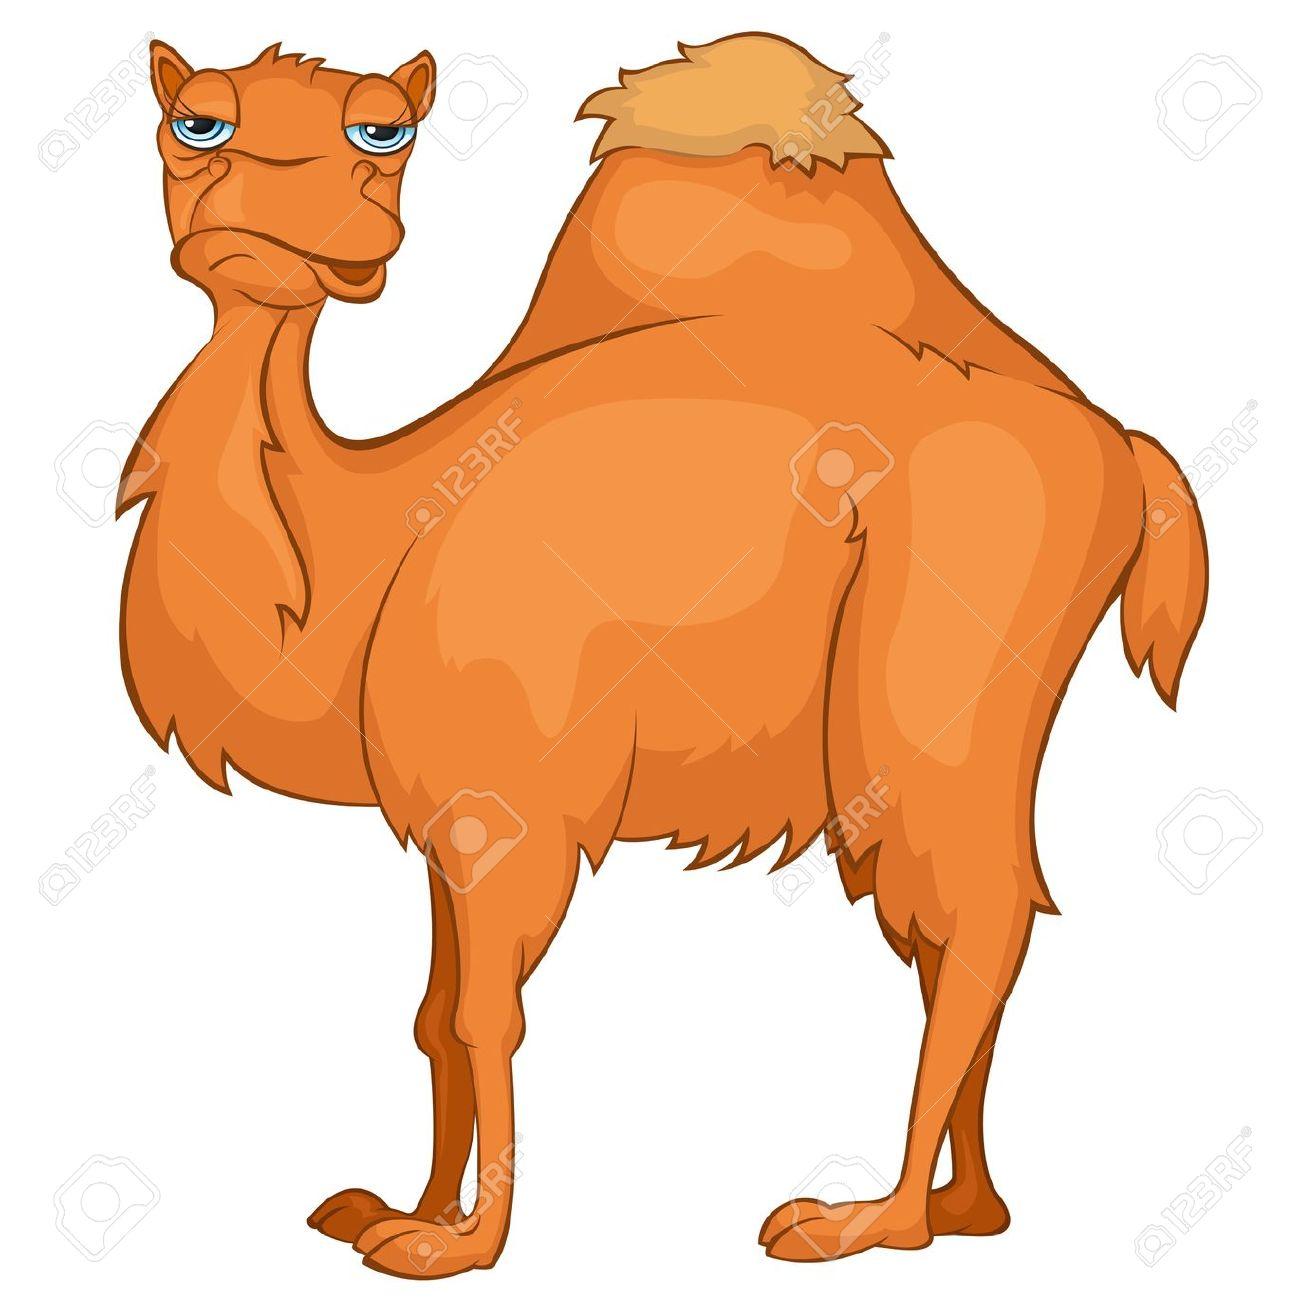 Cartoon Character Camel Royalty Free Cliparts, Vectors, And Stock.